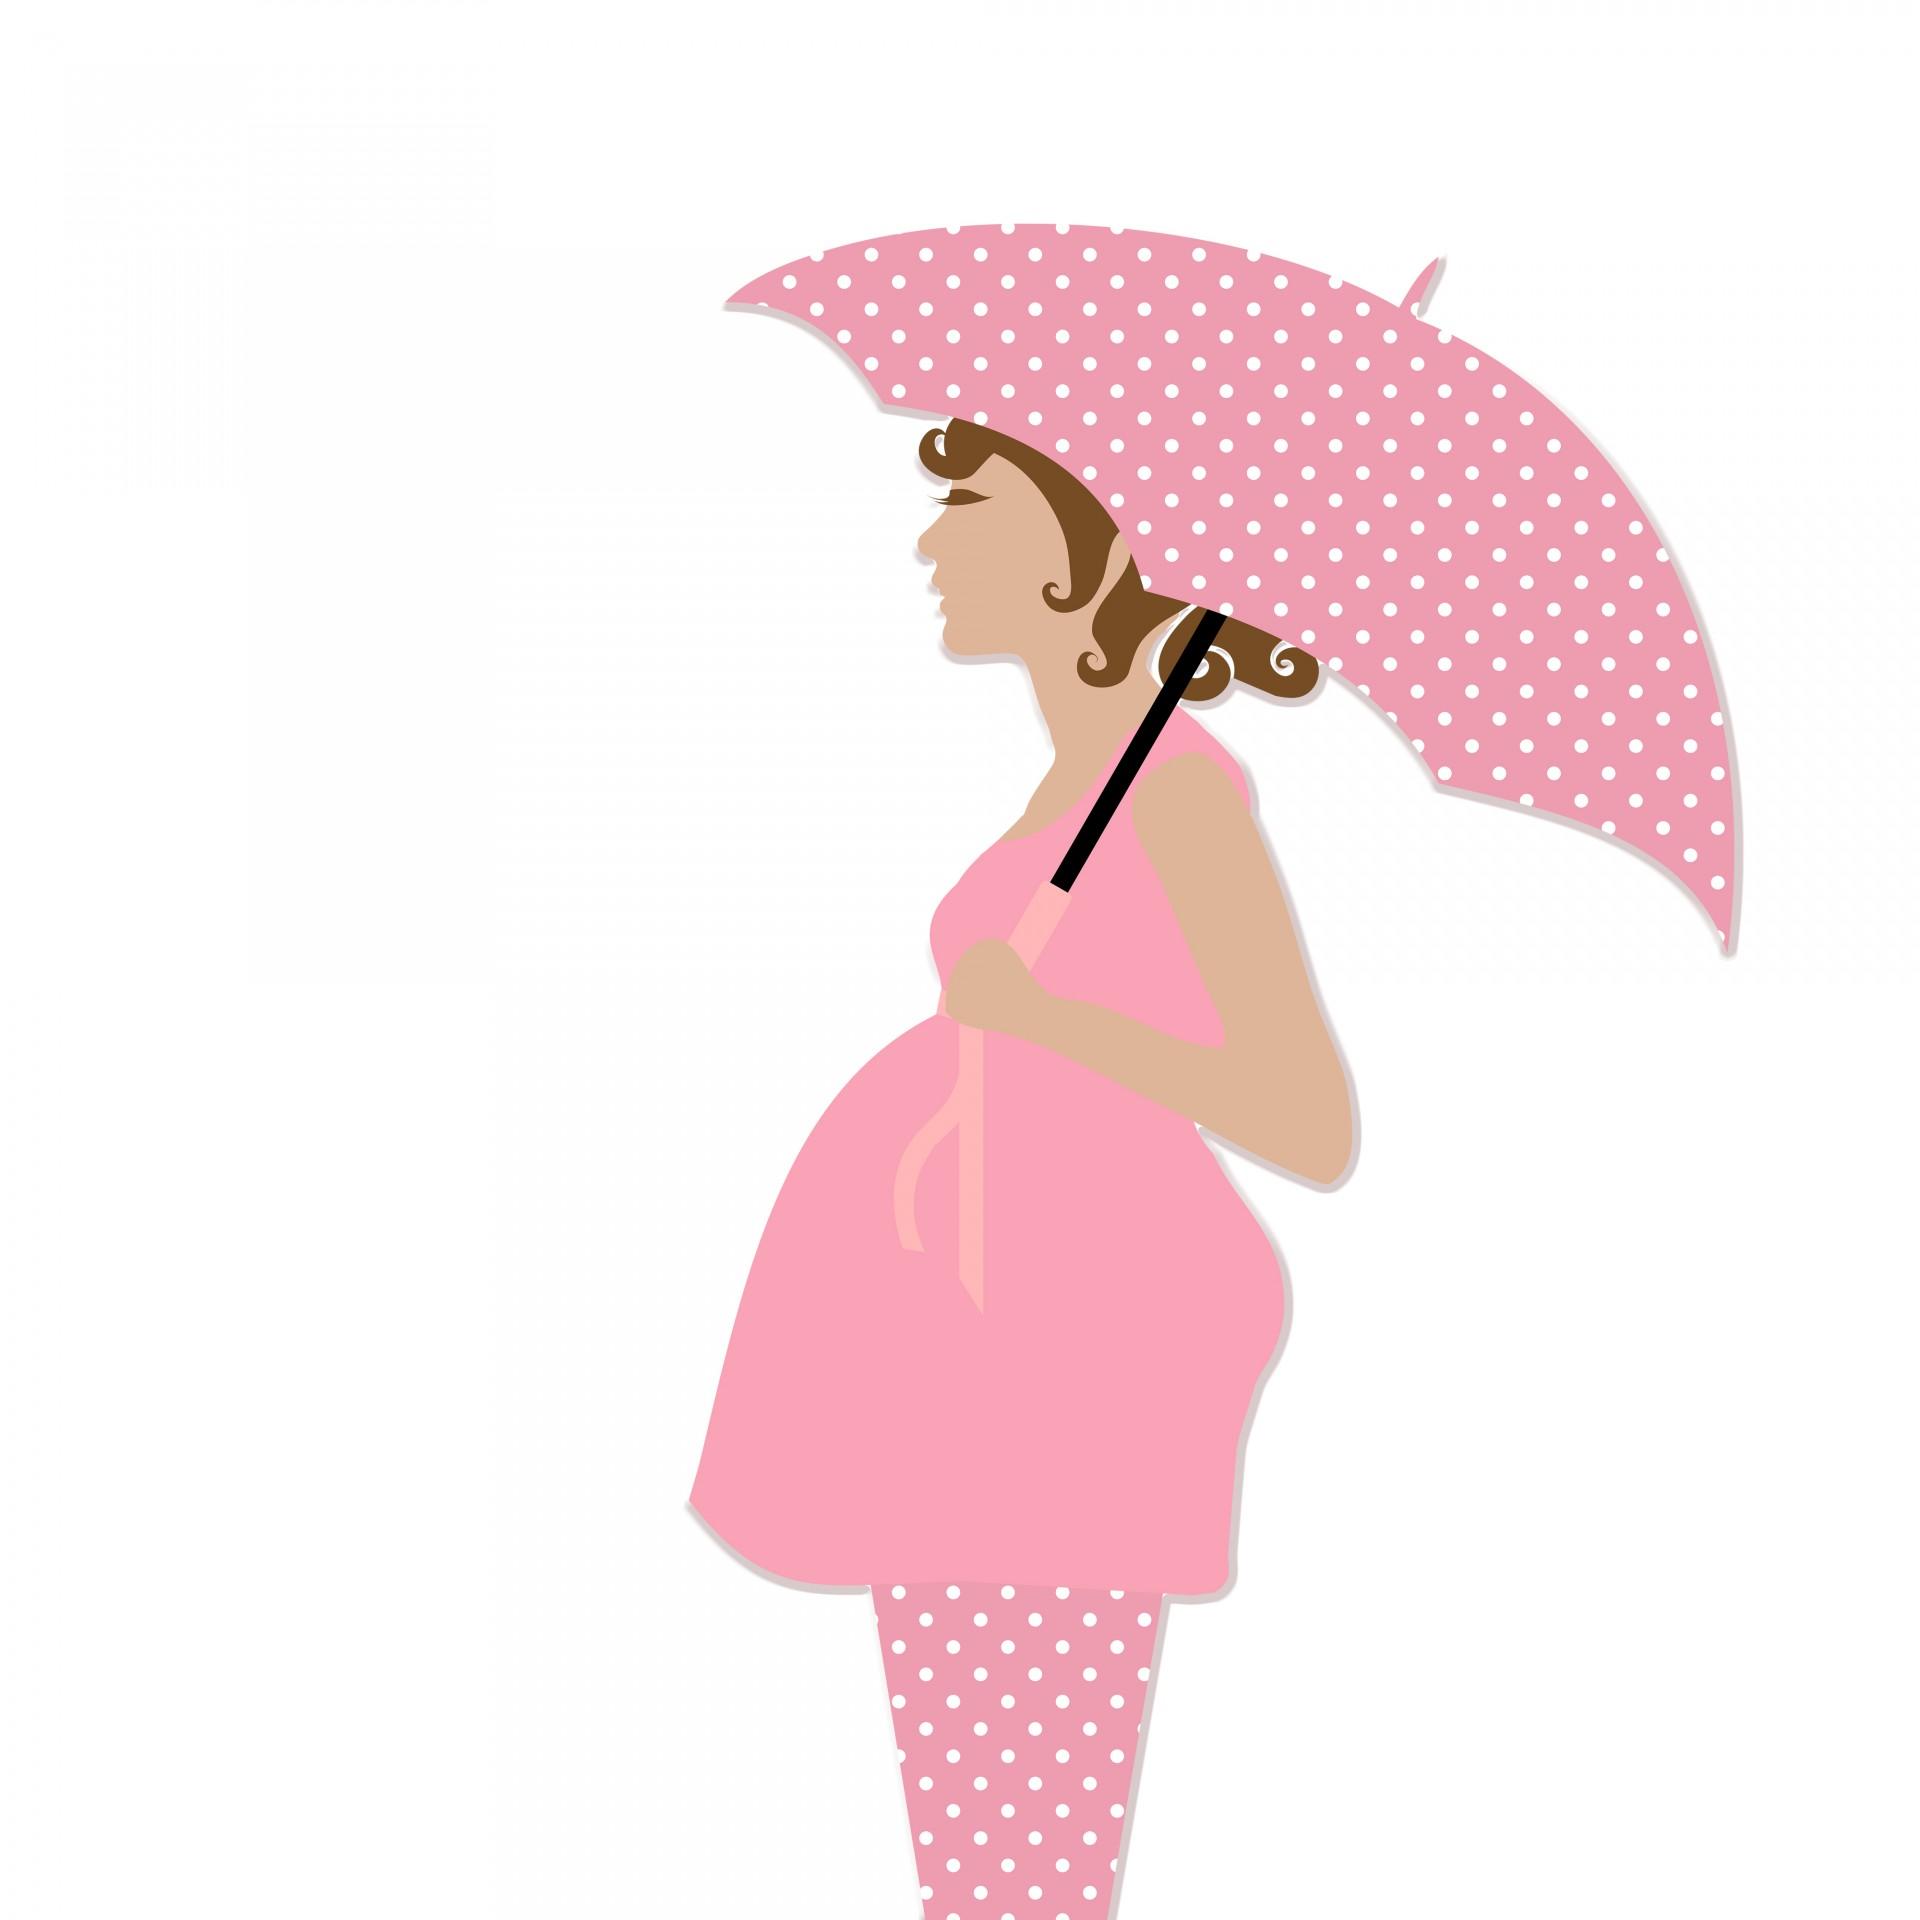 Woman clipart pregnent With Woman Pregnant Pregnant Umbrella